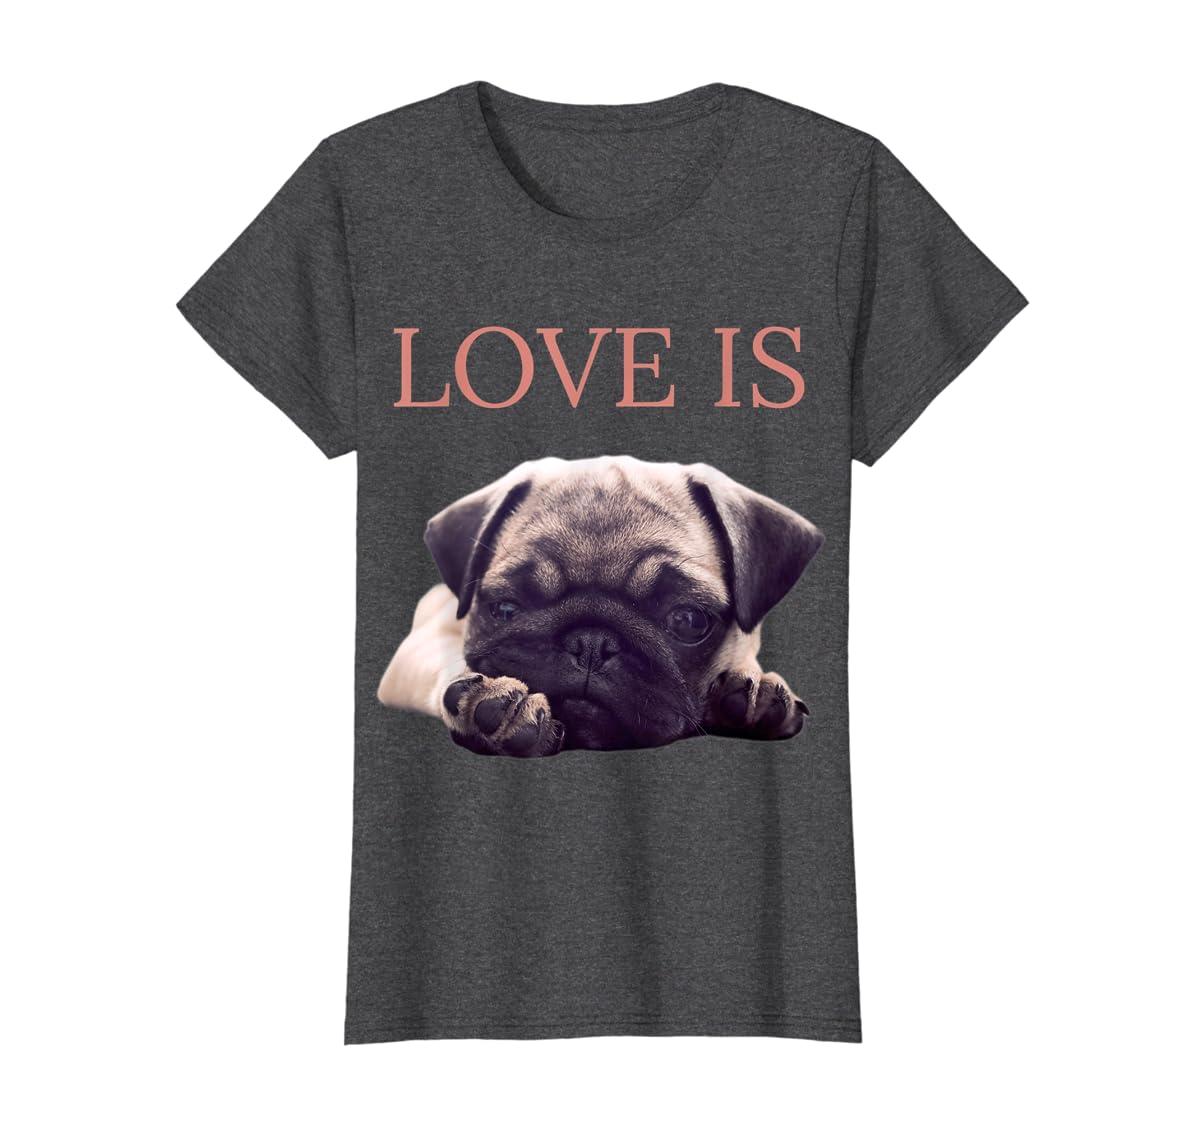 Mothers Day Pug Shirt Women Men Pug Mom Life Tee Love Is Dog-Women's T-Shirt-Dark Heather